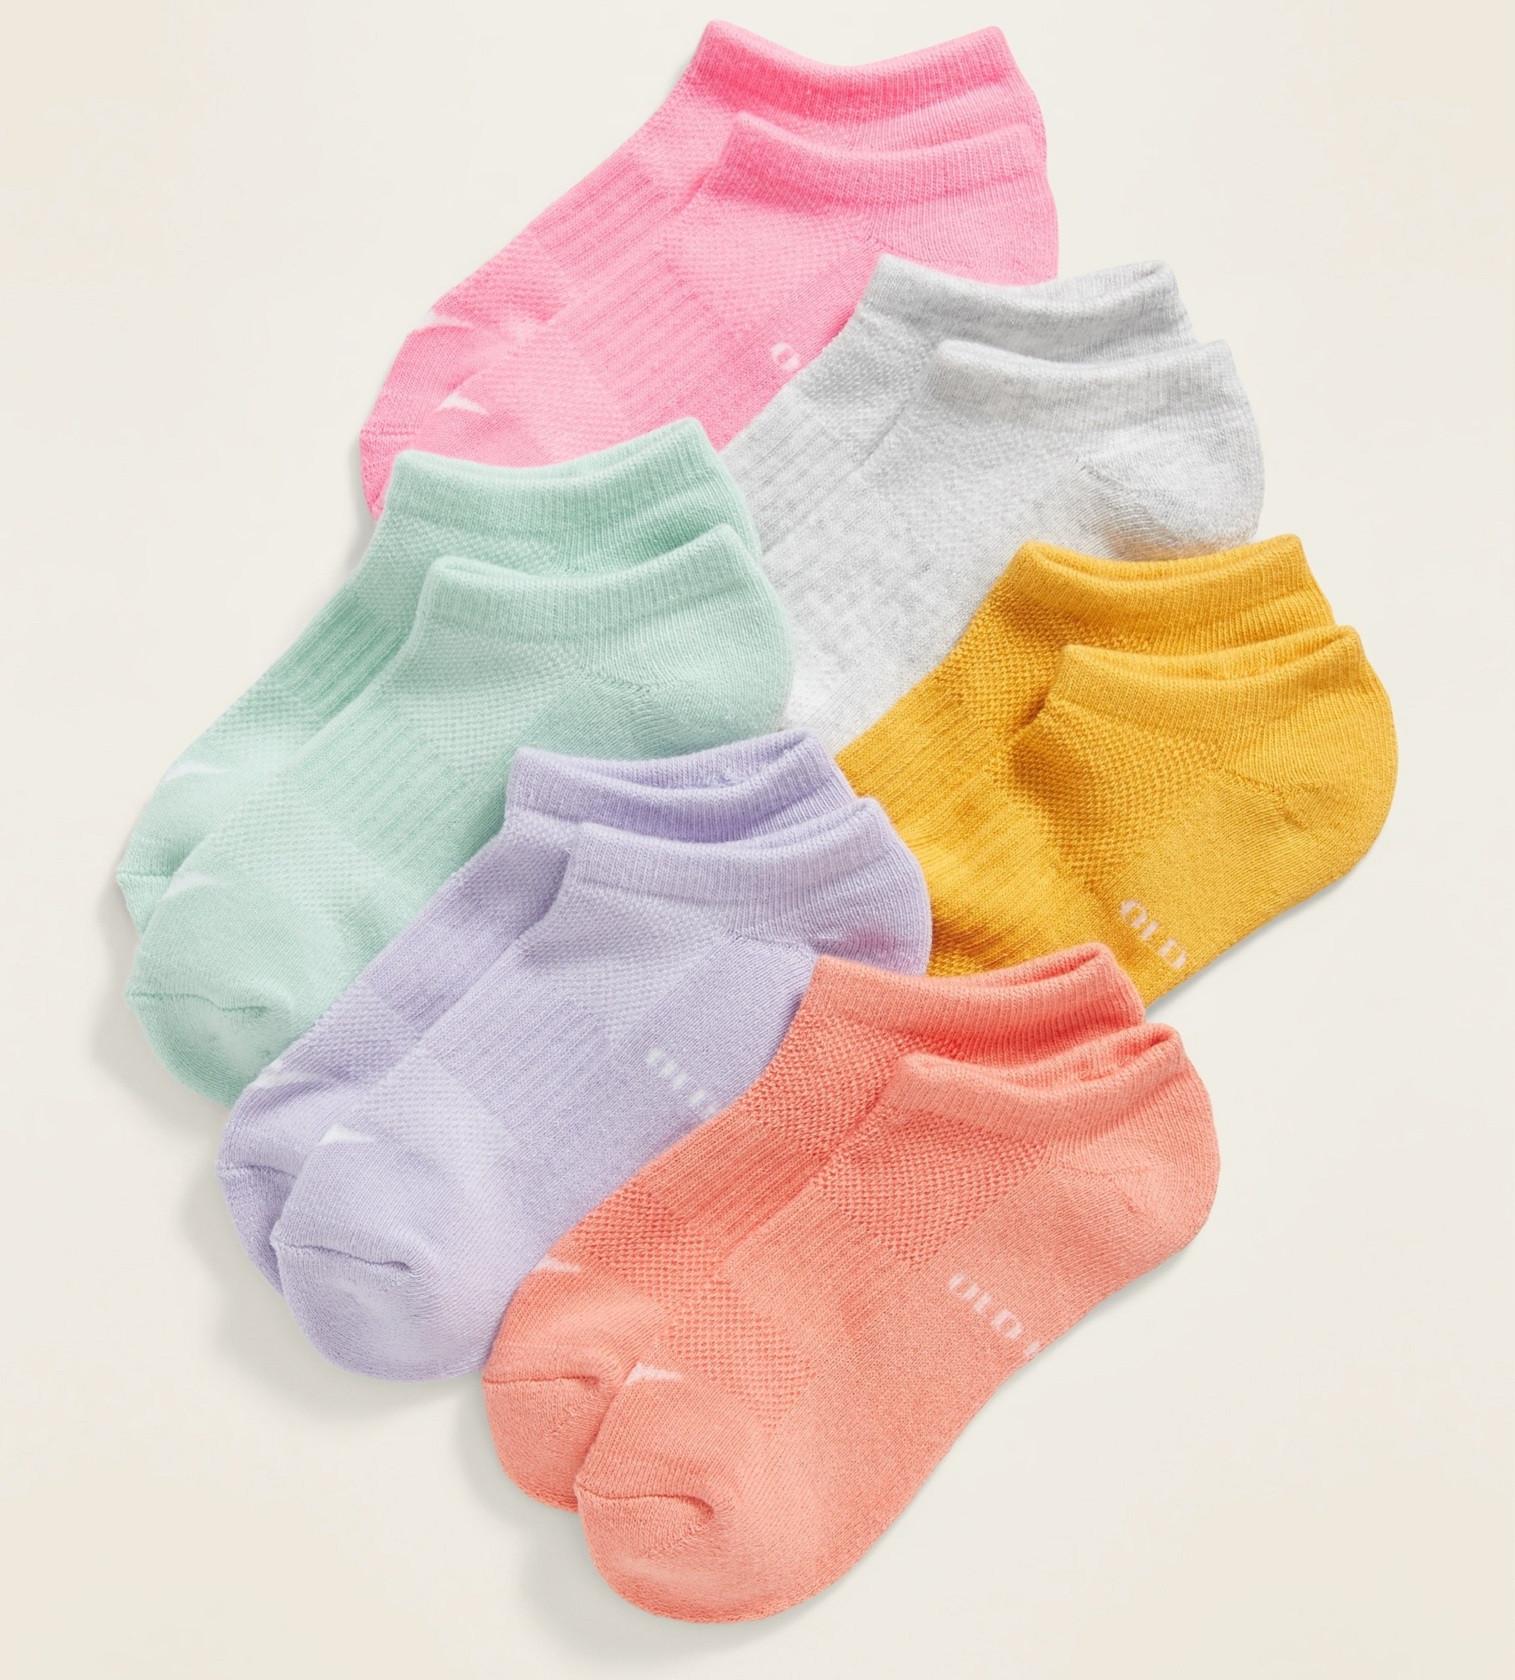 Купити Набір шкарпеток Socks 6-Pack Old Navy Solid Color - фото 1